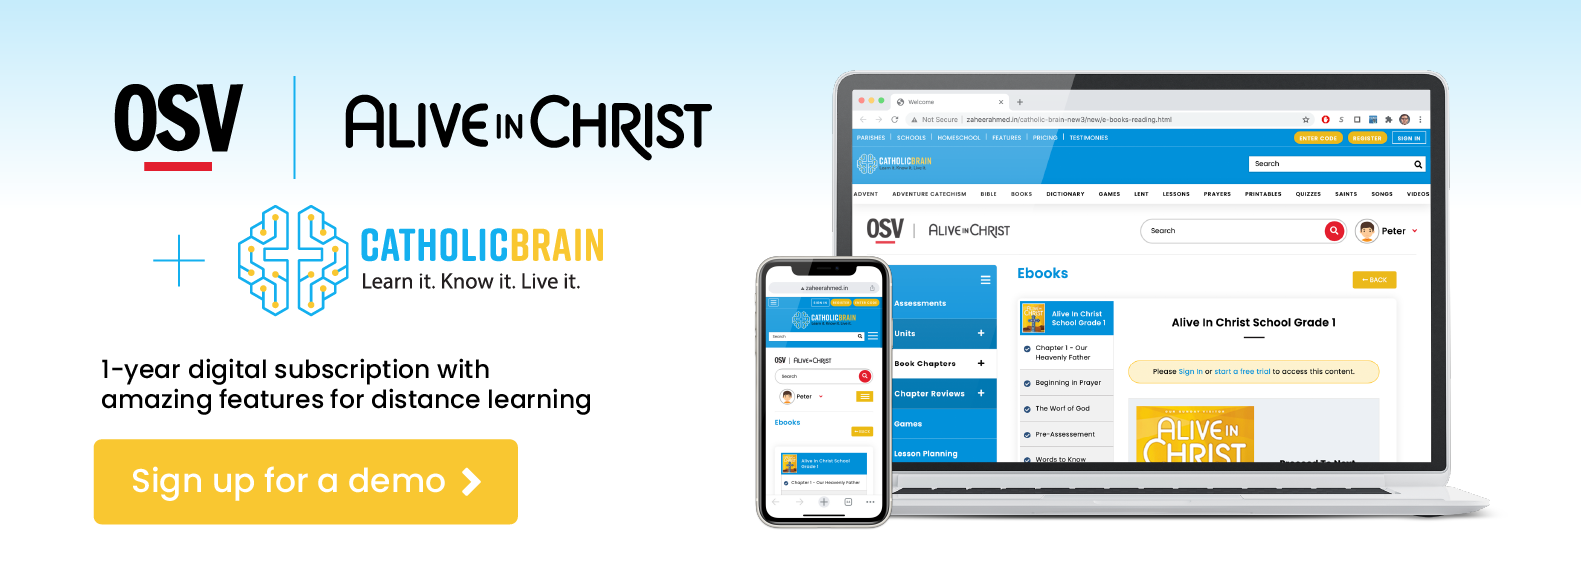 Alive In Christ School Grade 8